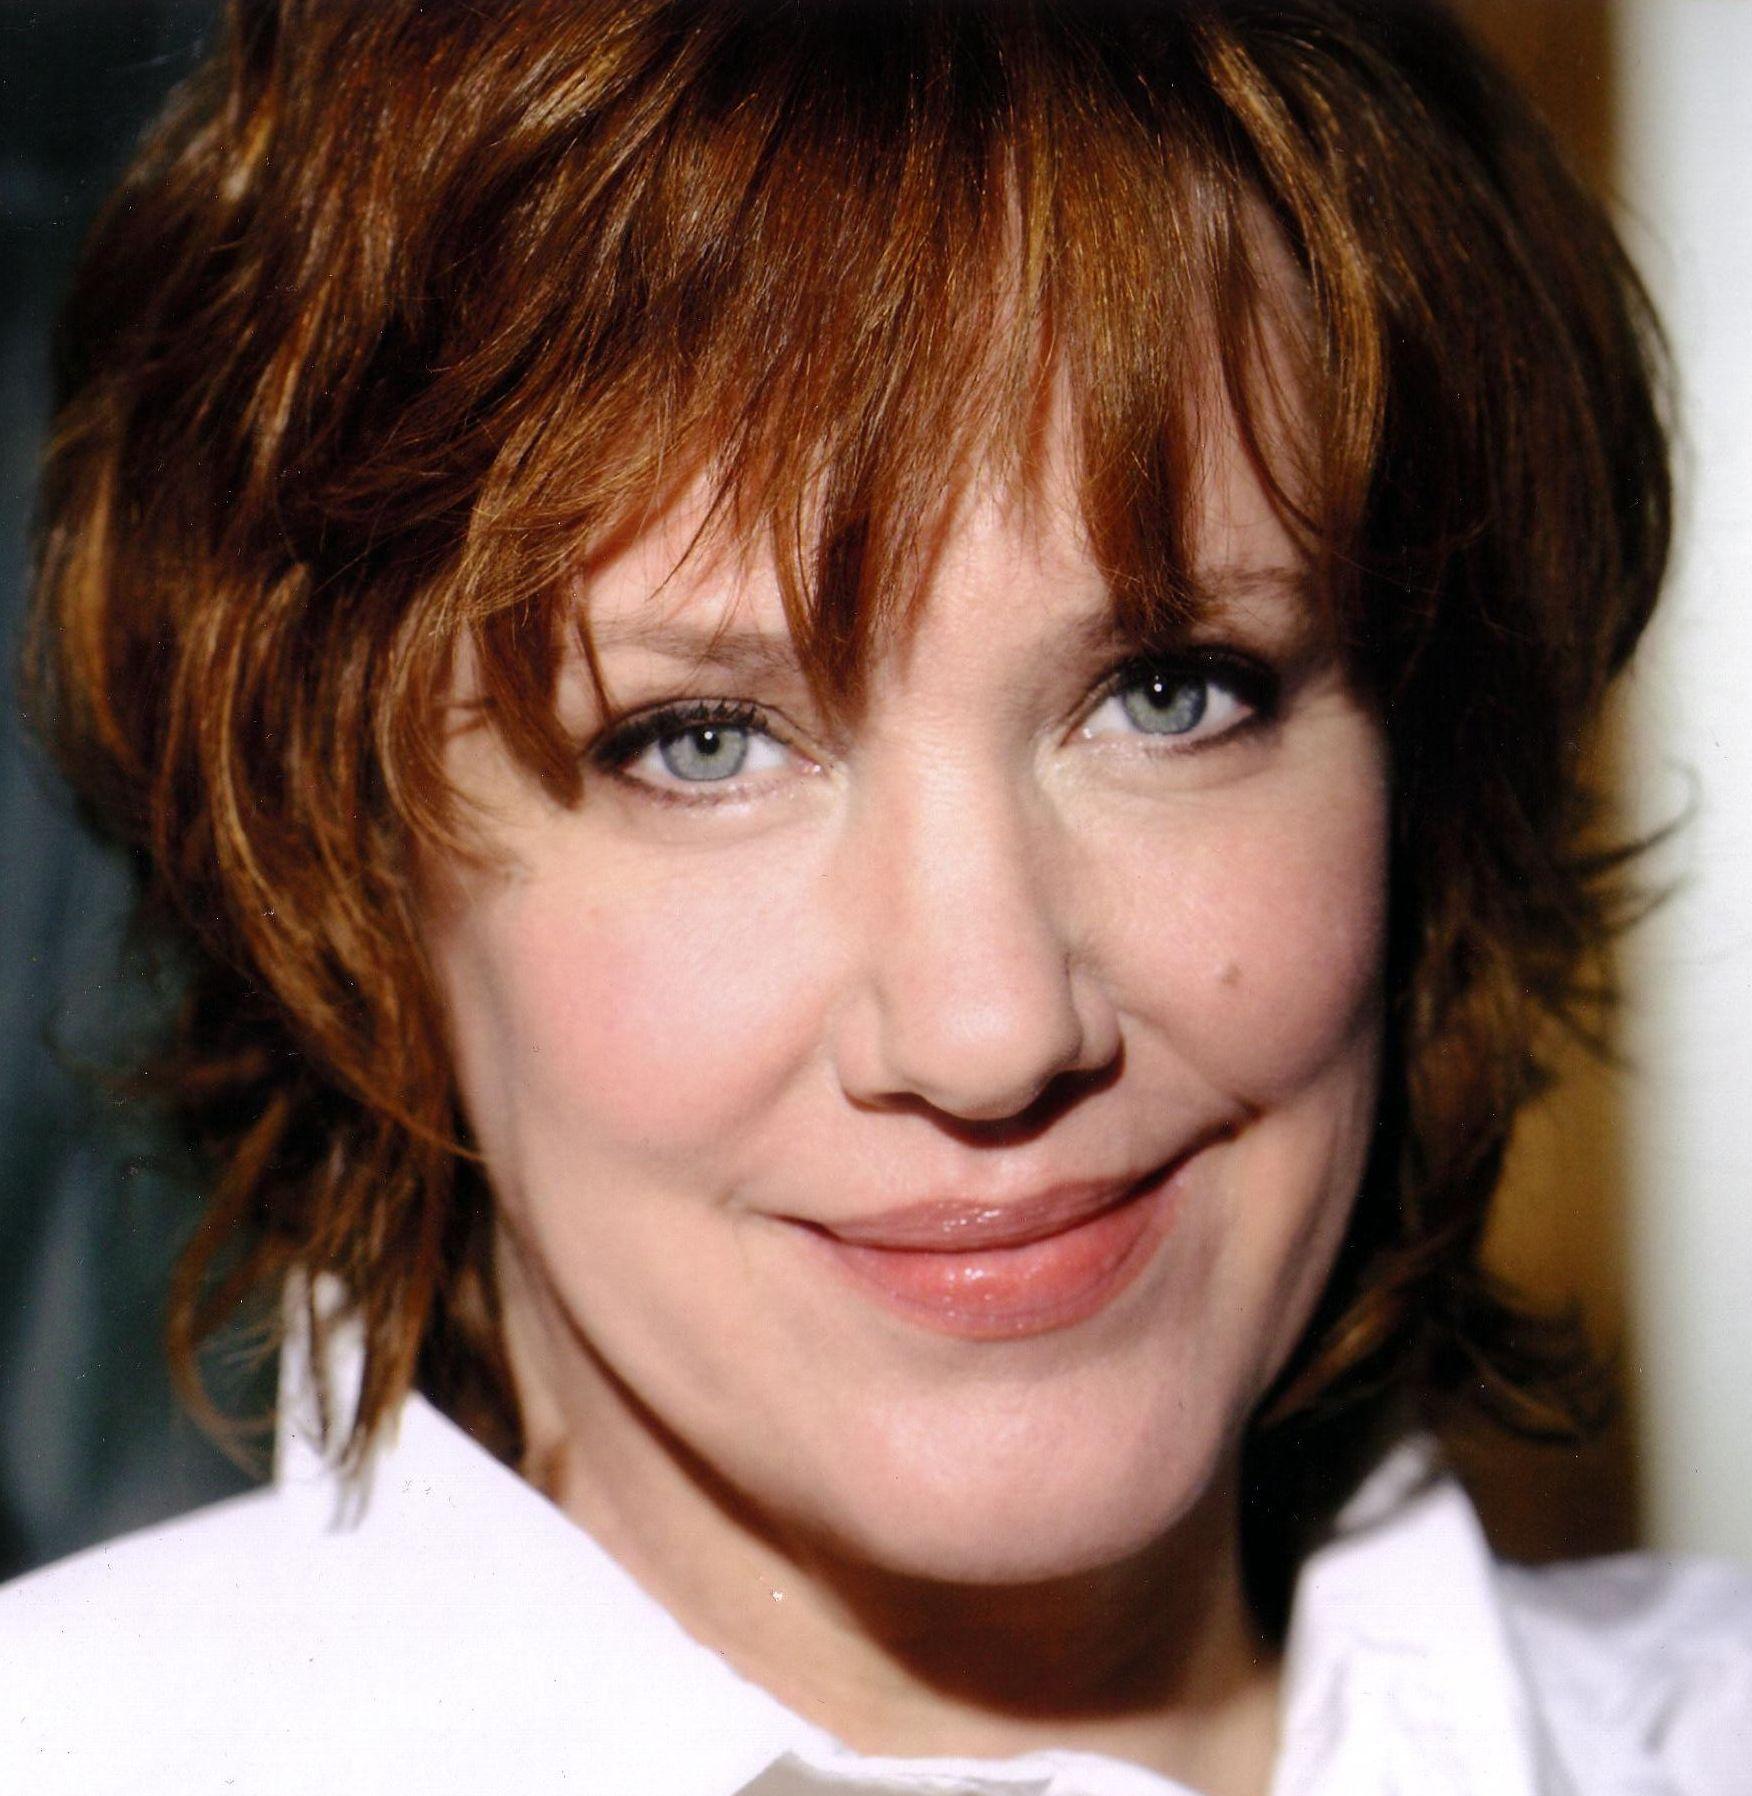 Paulette Bonafonte – Kathy Fitzgerald*